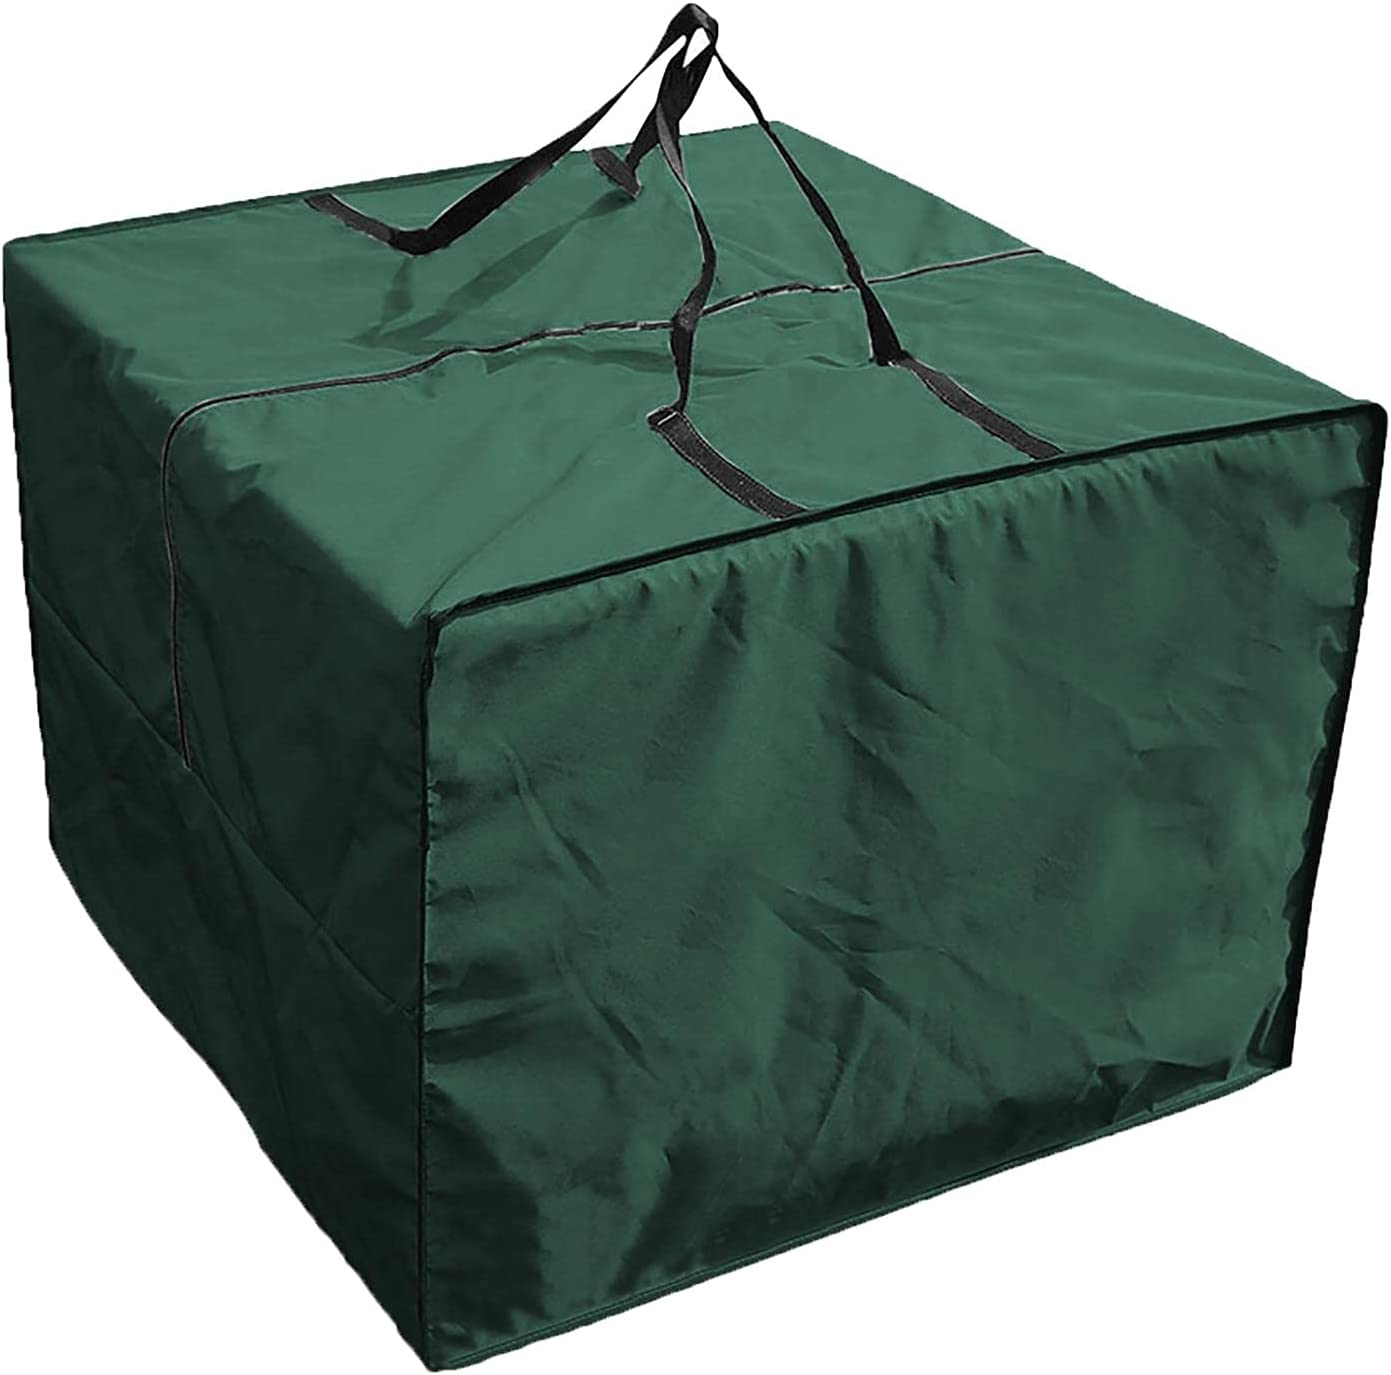 Glum Outdoor Cushion Storage Bag Patio Spasm price Our shop most popular 210D Durable Ba -